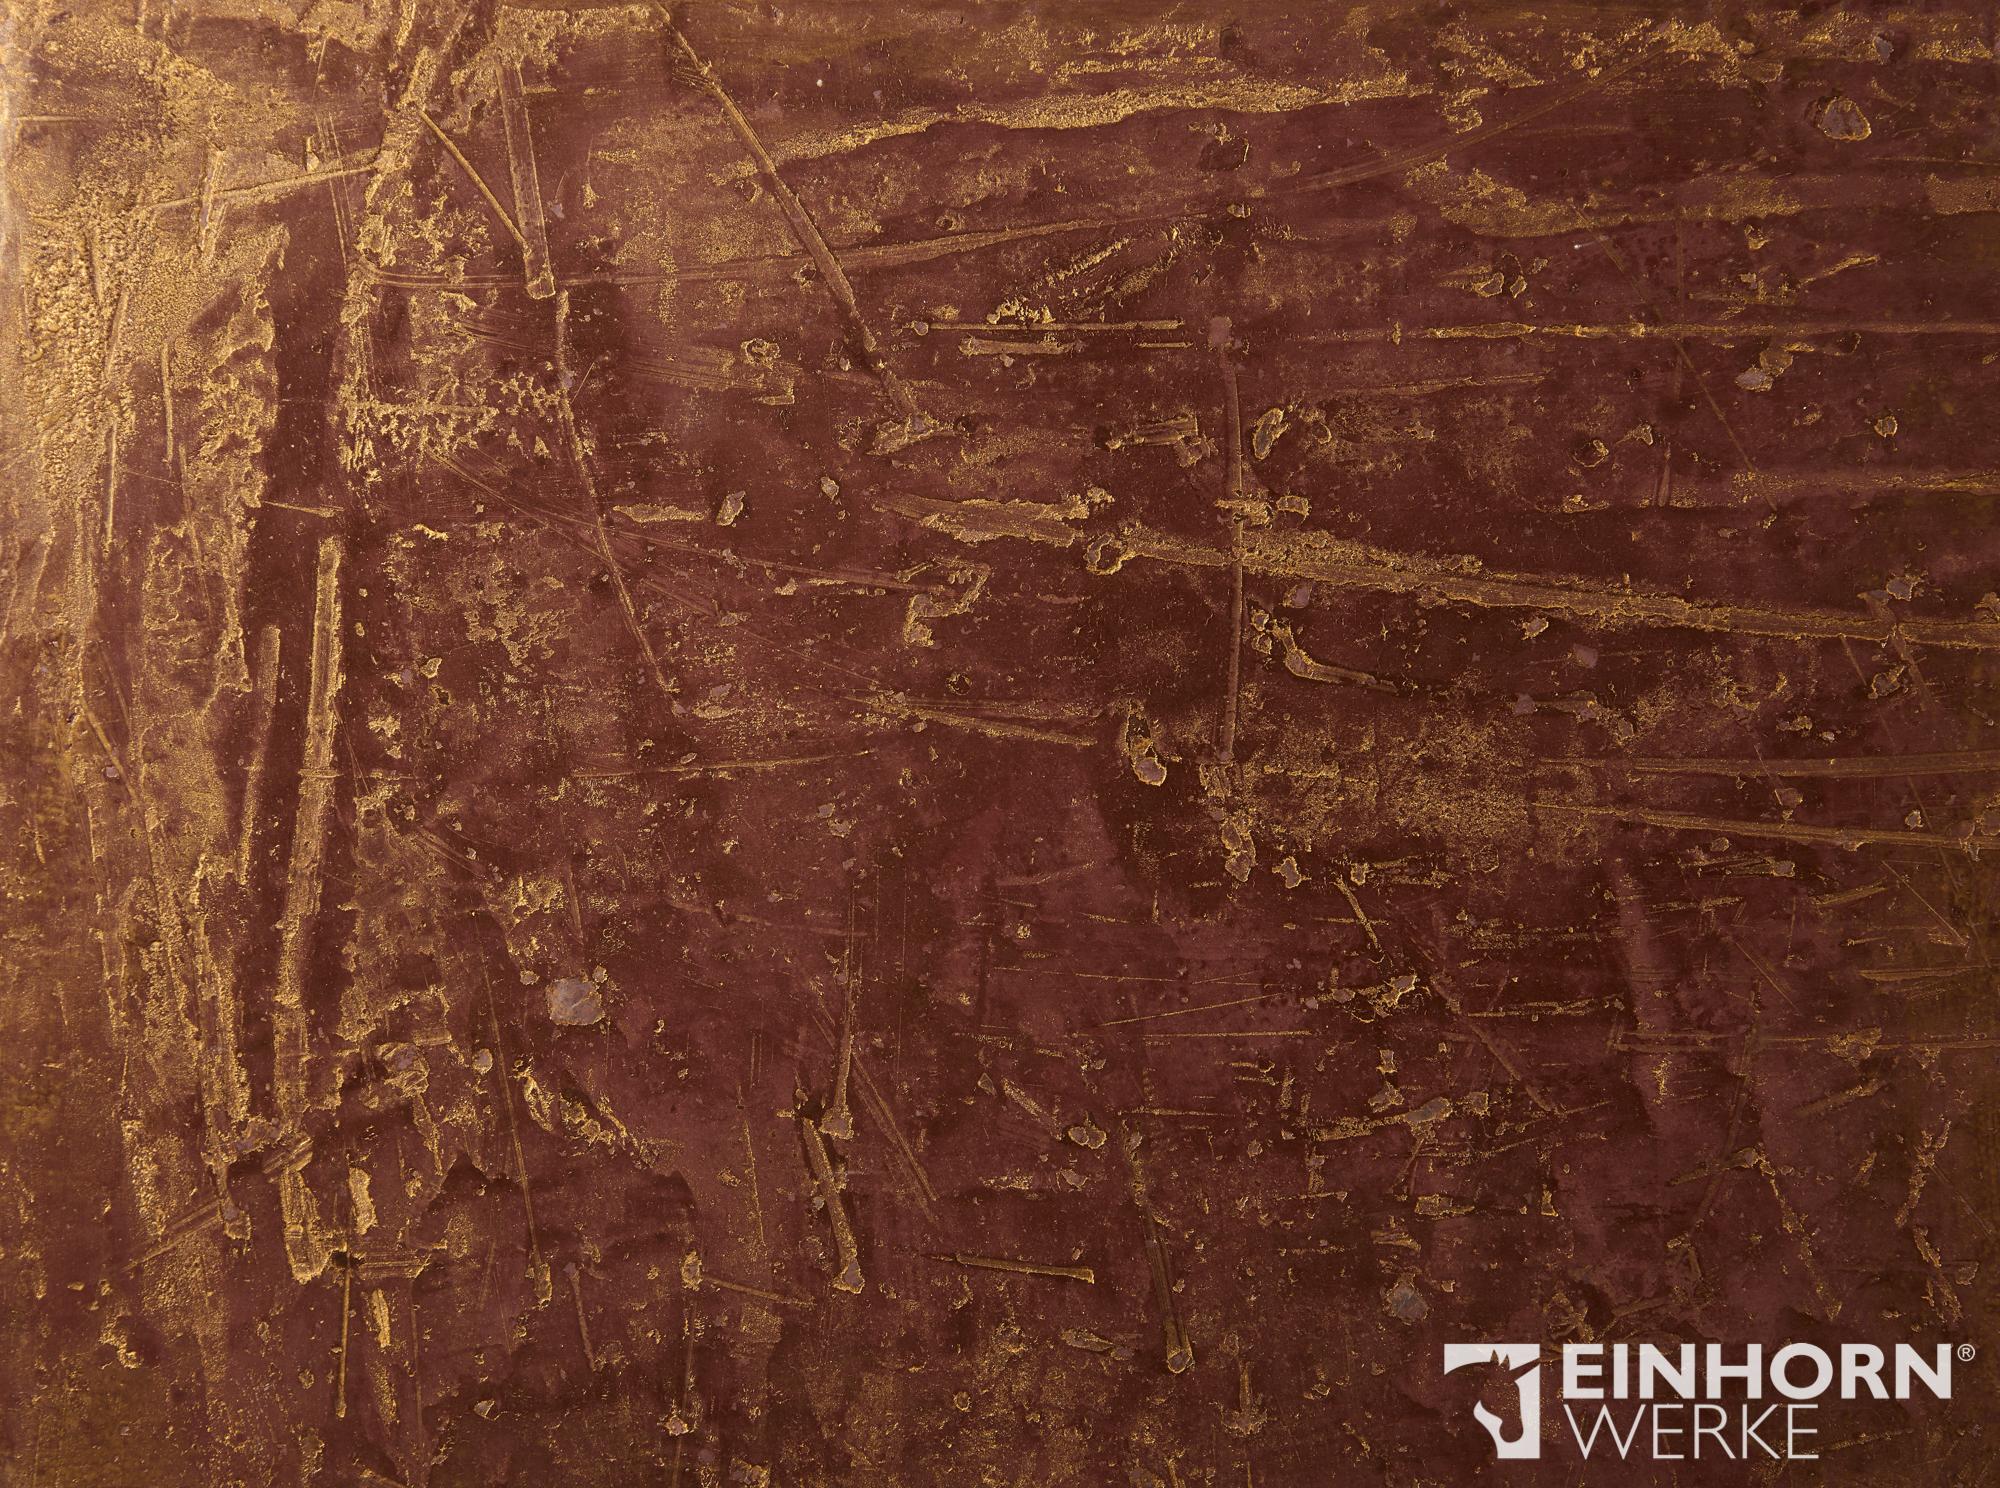 STUCCORINO 1306+ Perlglimmer grob + STUCCORINO Fresco 1306 + STUCCORINO Effect - Feingold